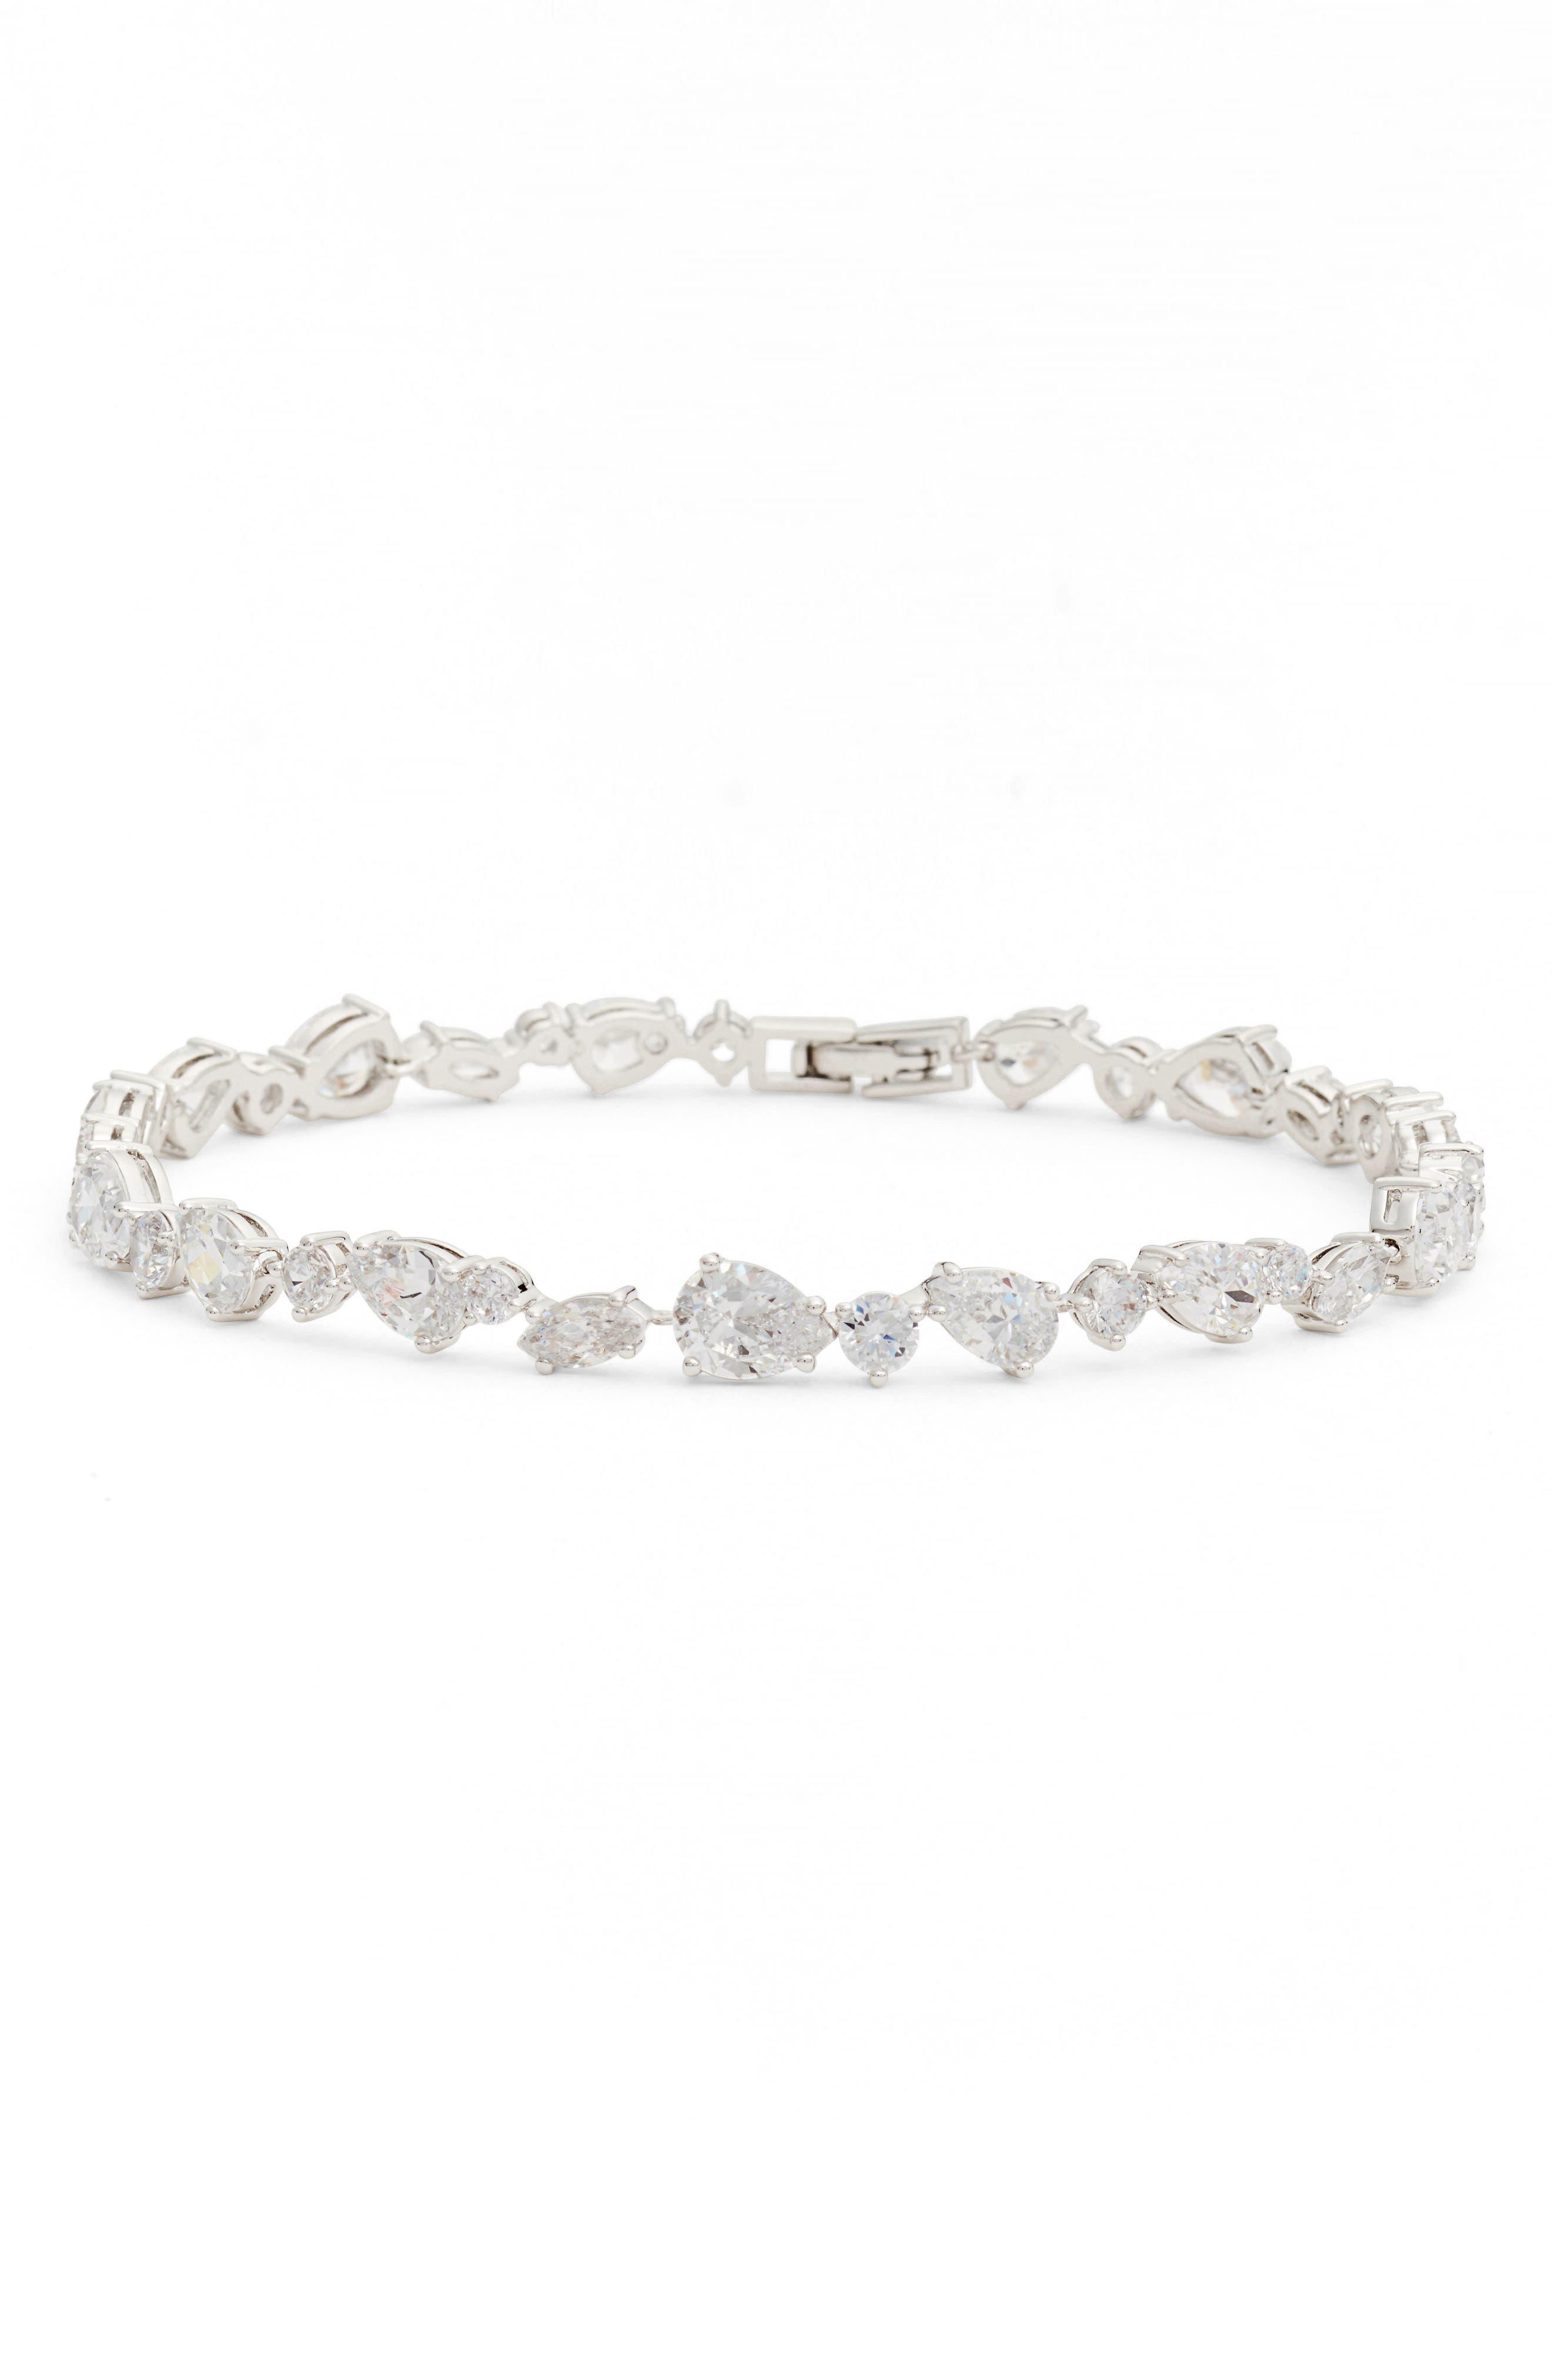 Ava Line Bracelet,                             Main thumbnail 1, color,                             Silver